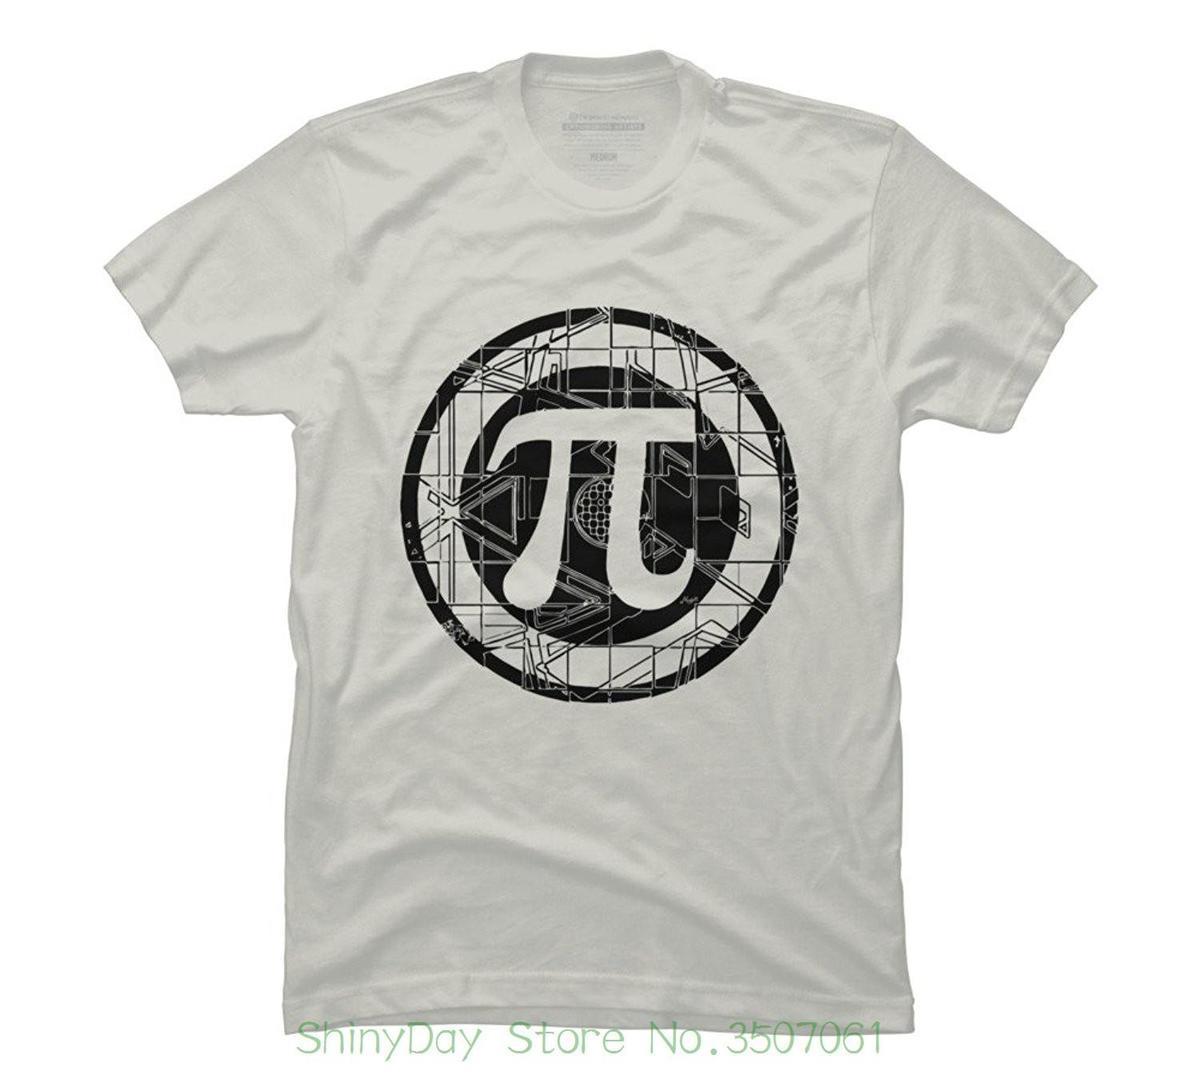 b9d9f58f5 Tee Shirt Hipster Harajuku Brand Clothing T-shirt Ultimate Pi Symbol 3.14  Men's Graphic T Shirt